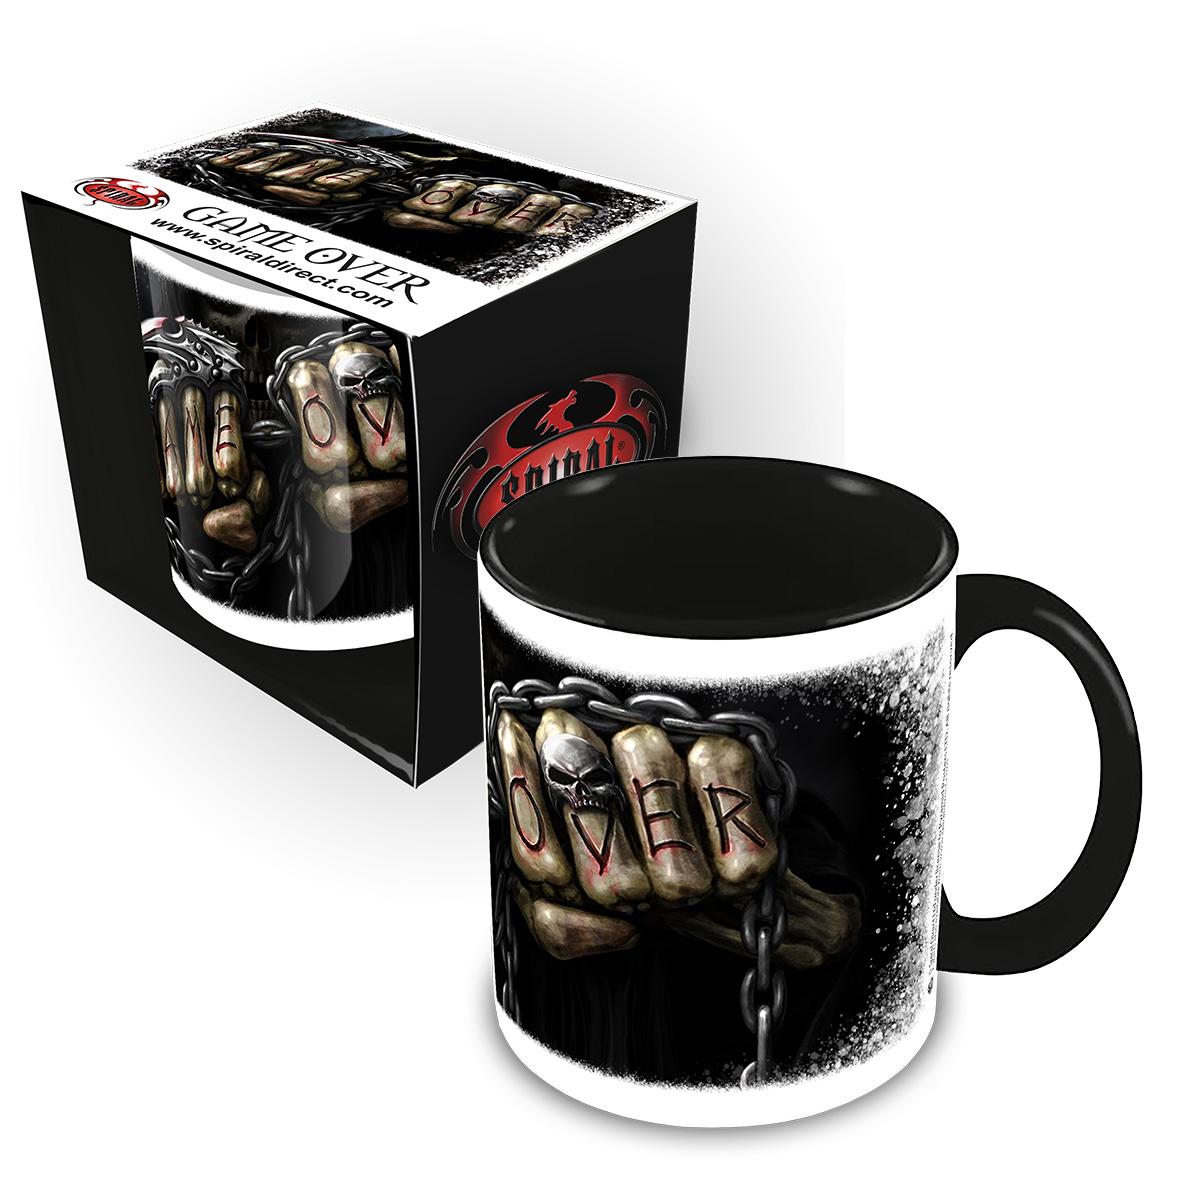 Game Over Ceramic Mug 0.3L - Gift Boxed